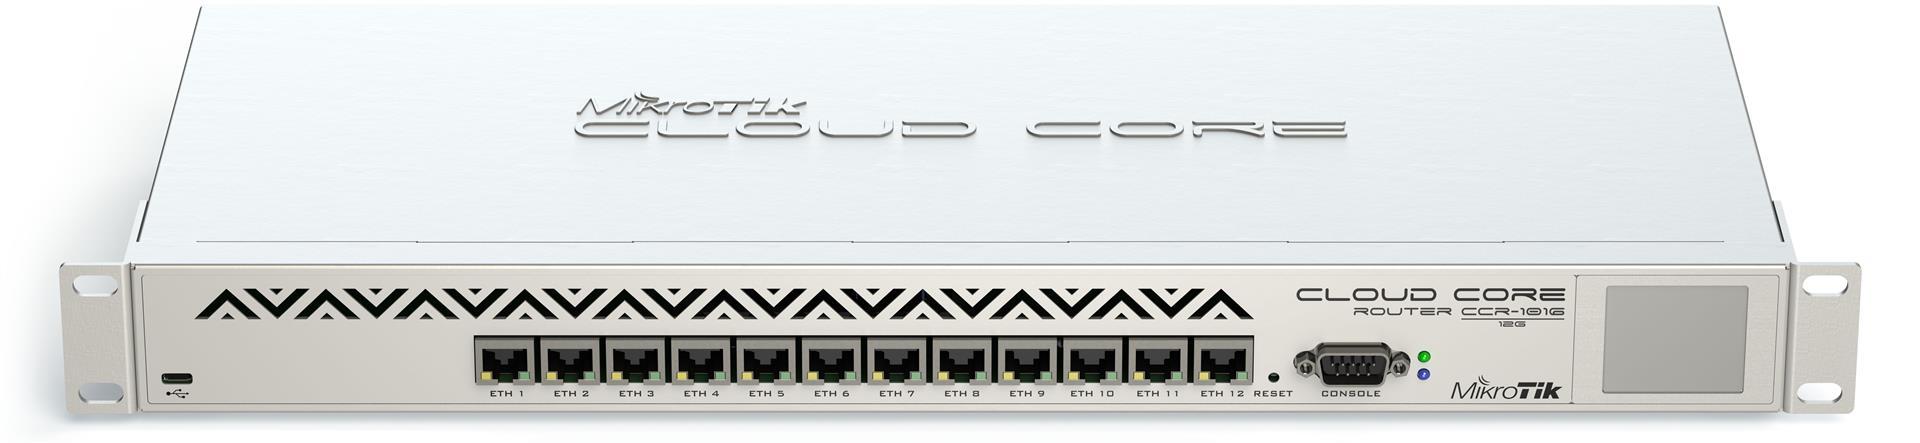 MikroTik CCR1016-12G 2GB RAM, 1200MHz, RouterOS L6